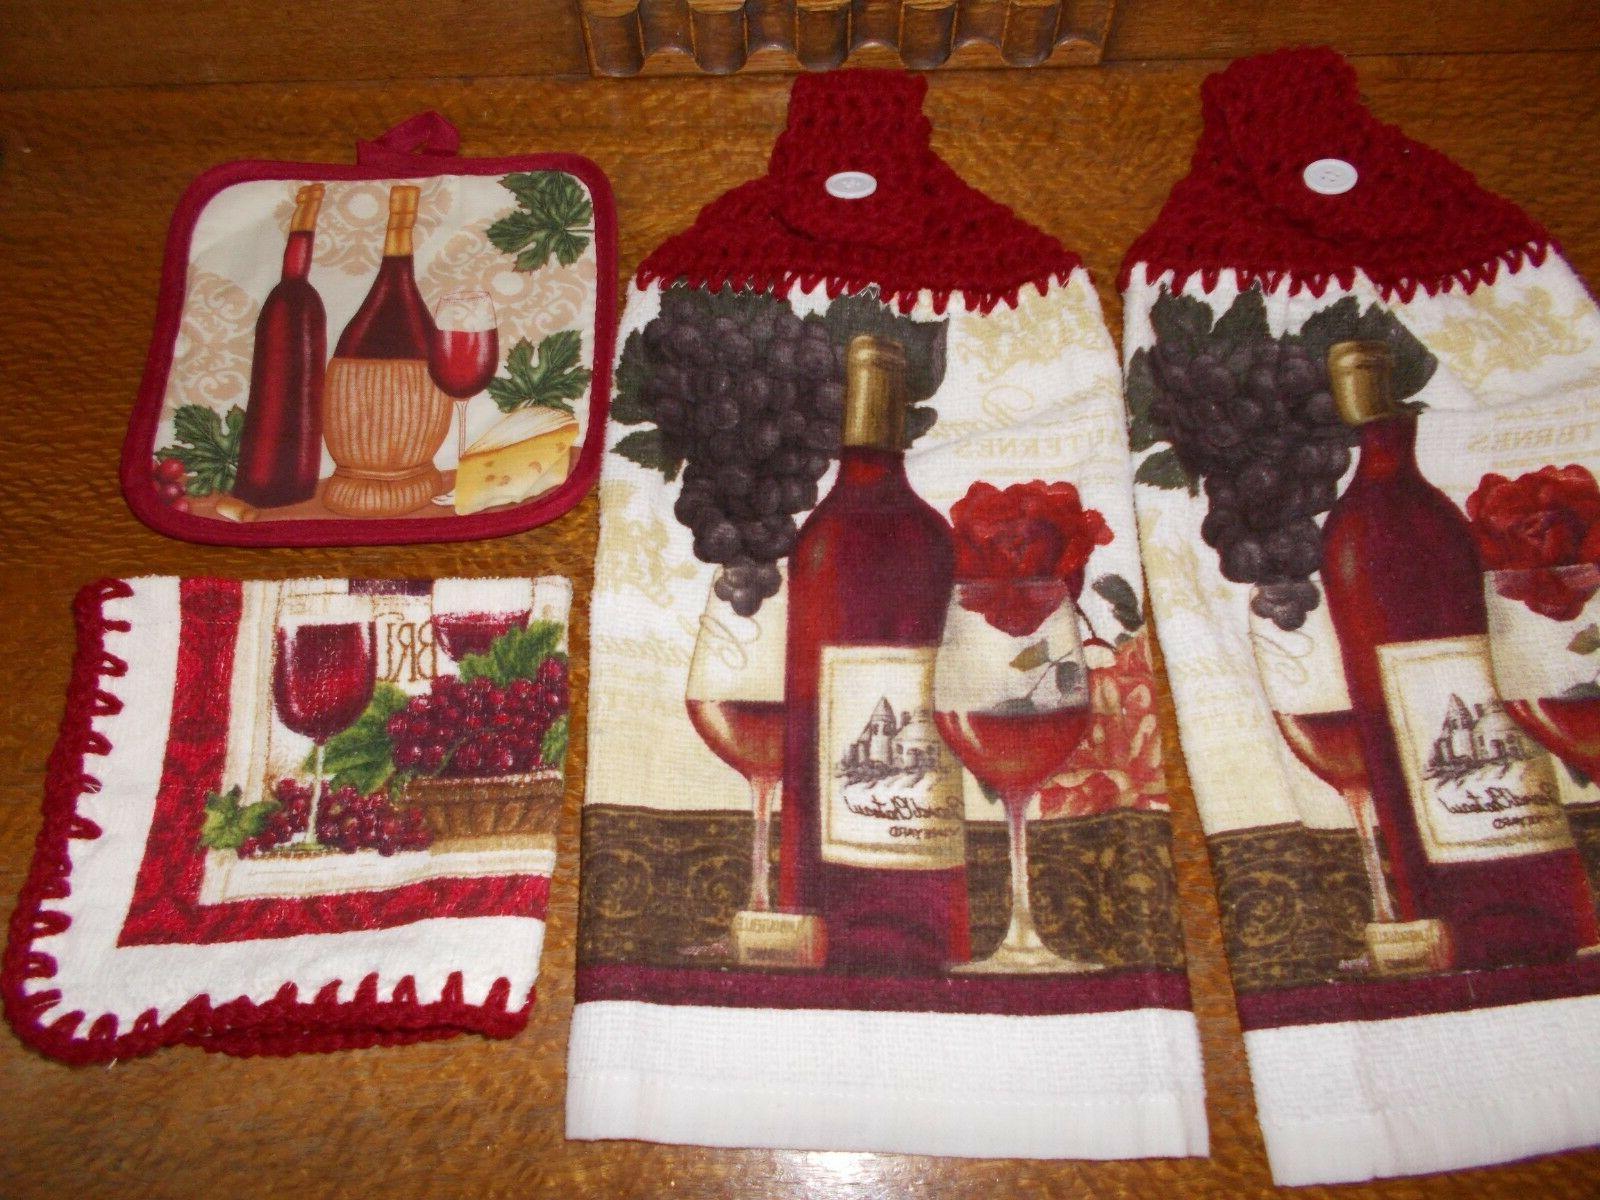 4 pc-HANGING KITCHEN TOWEL SET, Dark Red  CROCHET TOPS -  WI